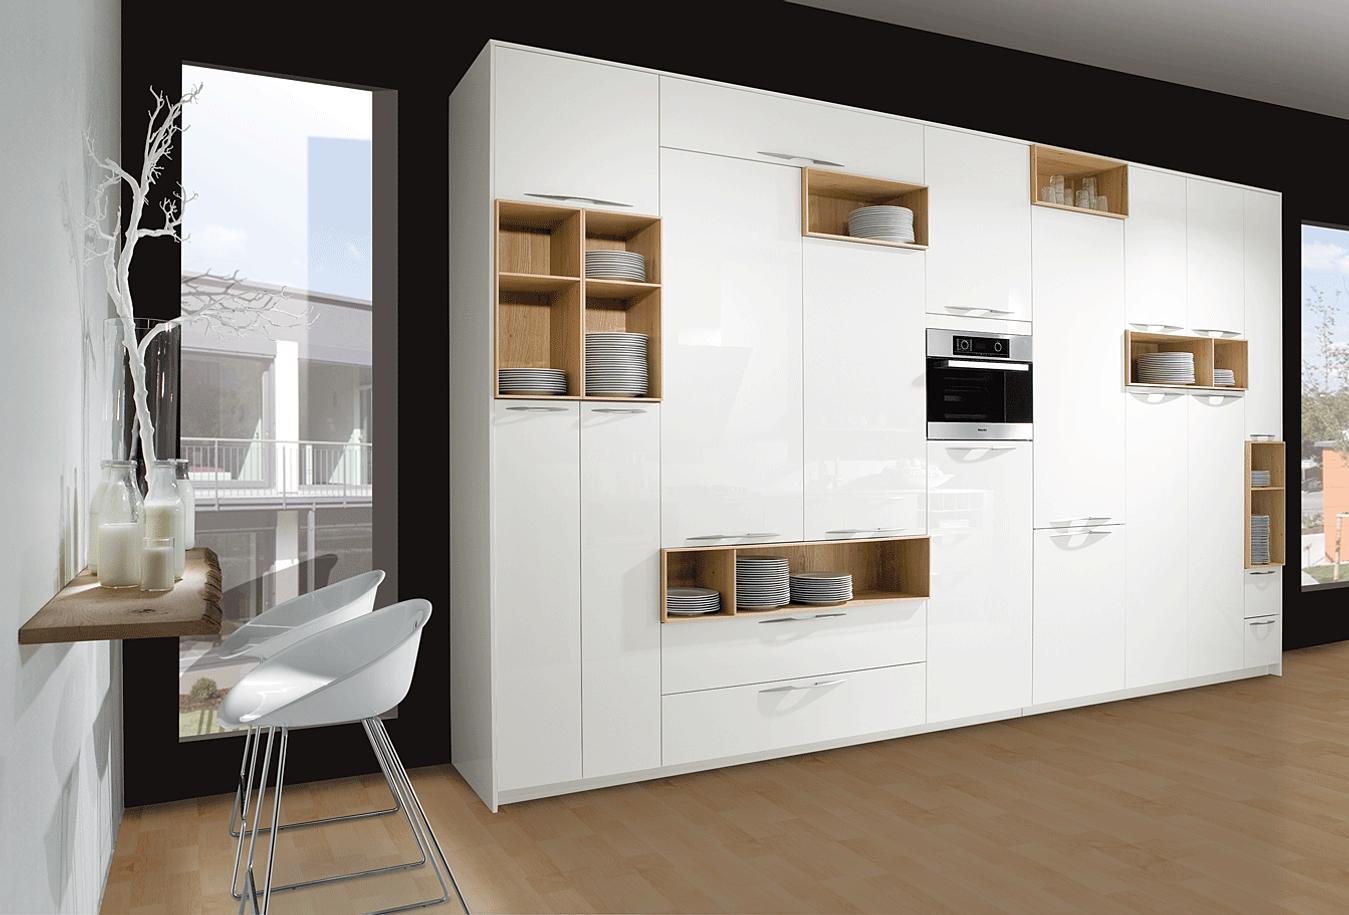 k chen rosenheim designwerk christl k chen nach ma. Black Bedroom Furniture Sets. Home Design Ideas